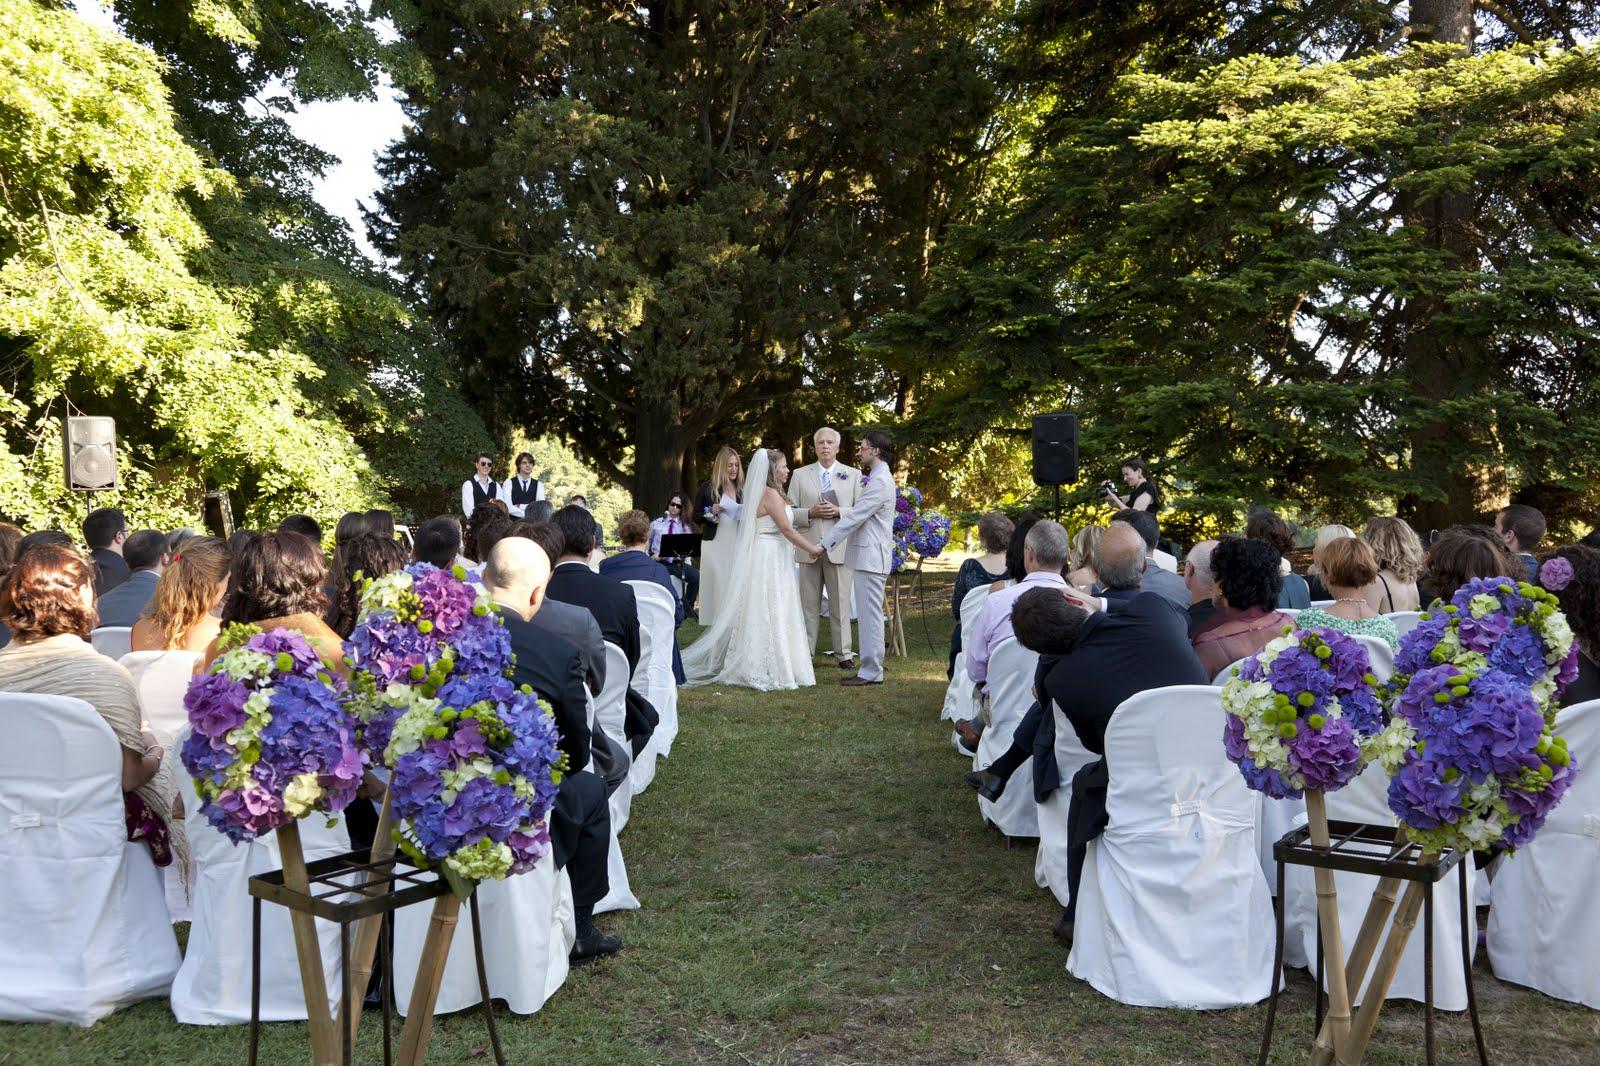 Real Weddings Winter: Little Winter Bride: REAL WEDDING: PART II: Italian Vineyard